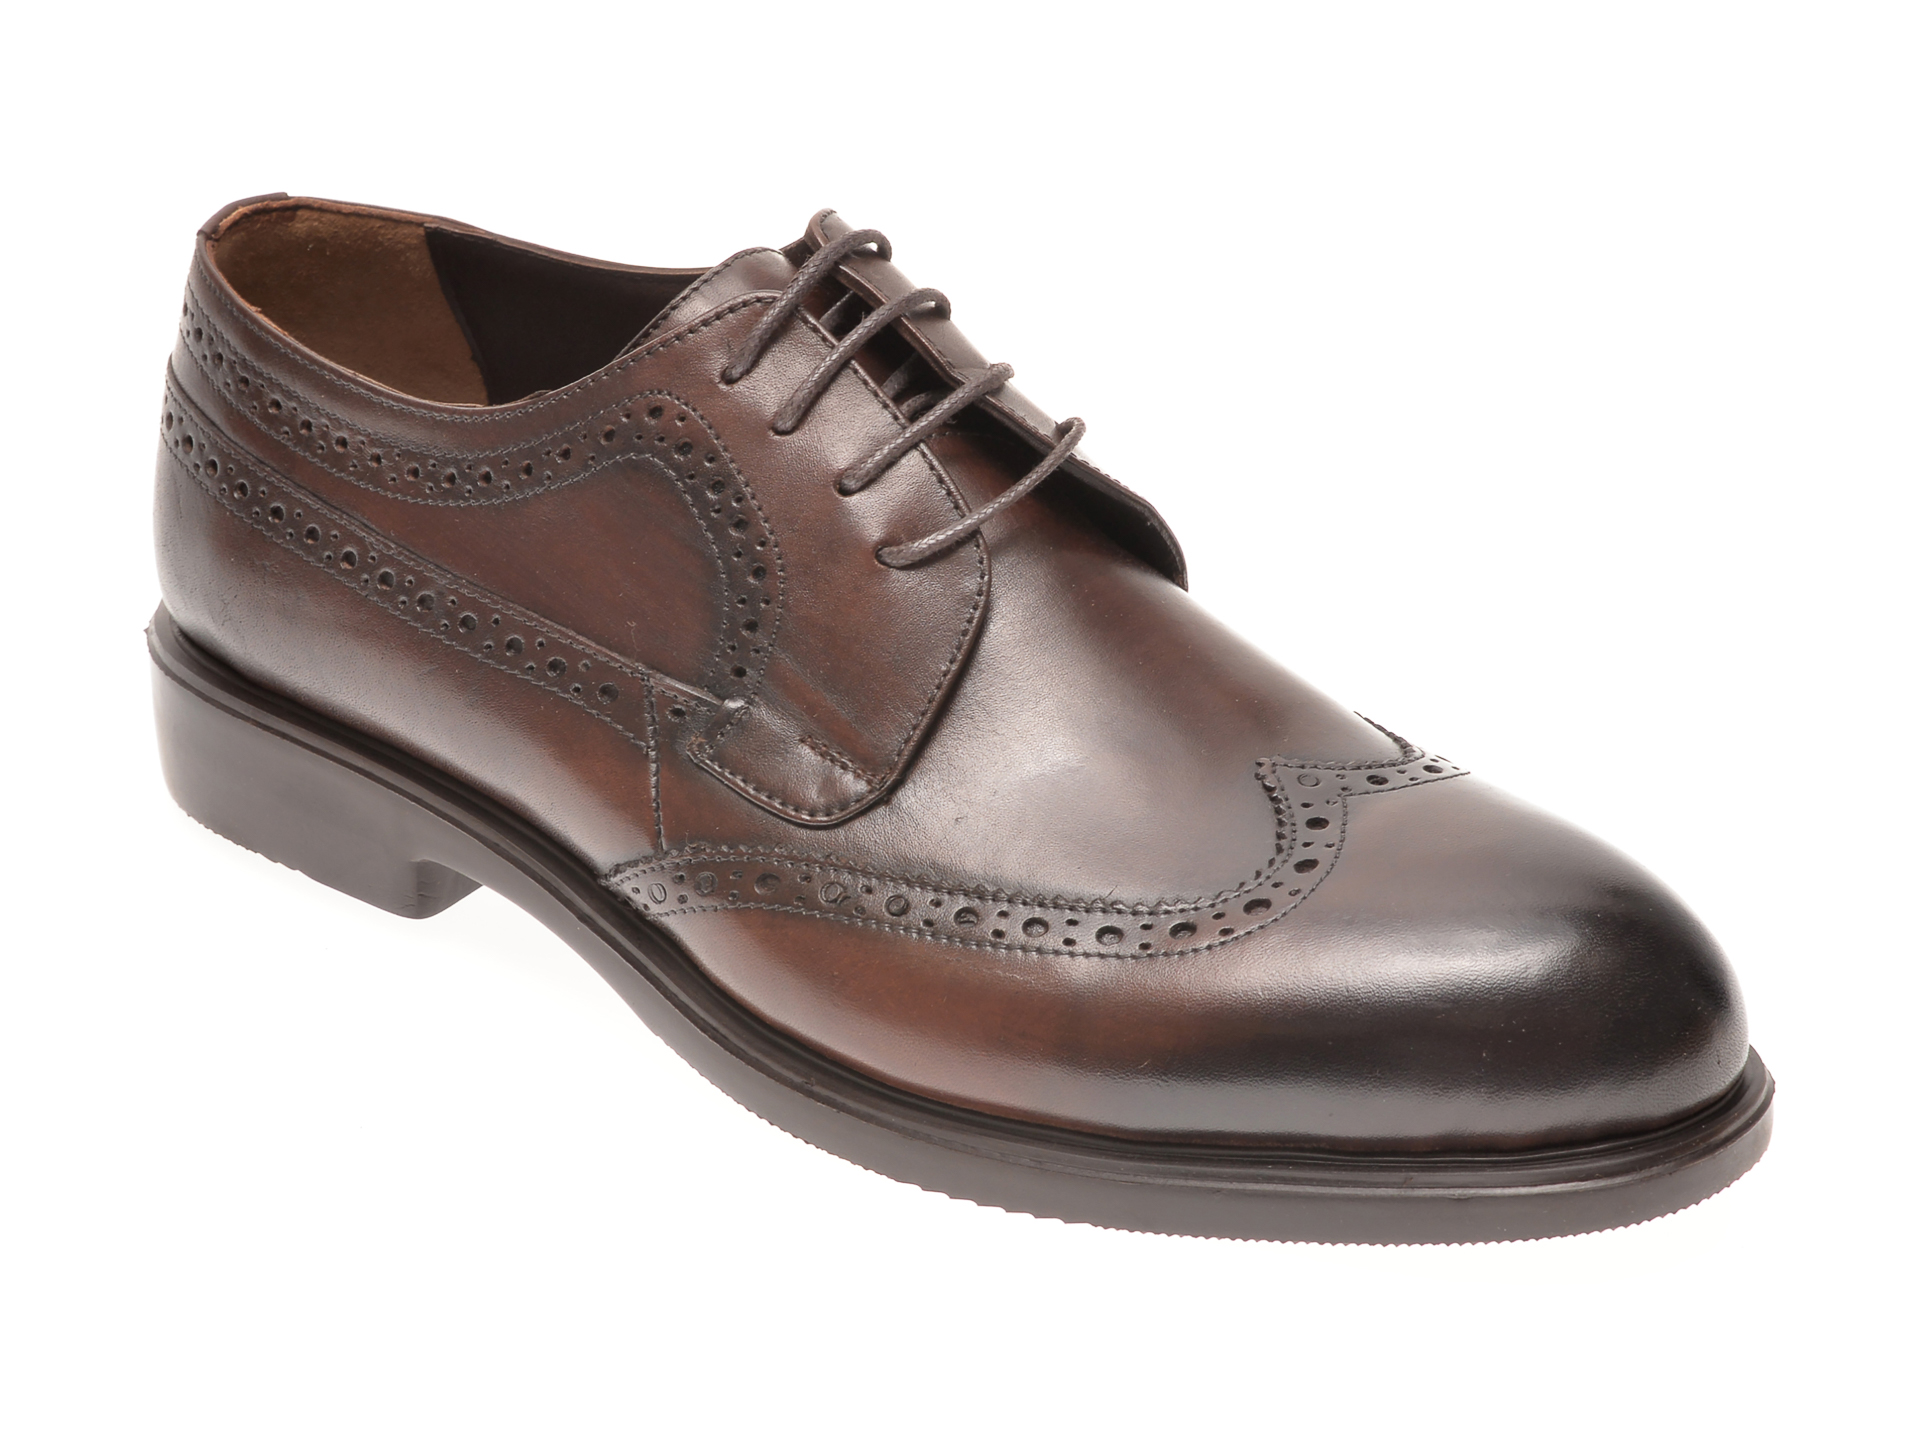 Pantofi OTTER maro, 1042, din piele naturala imagine